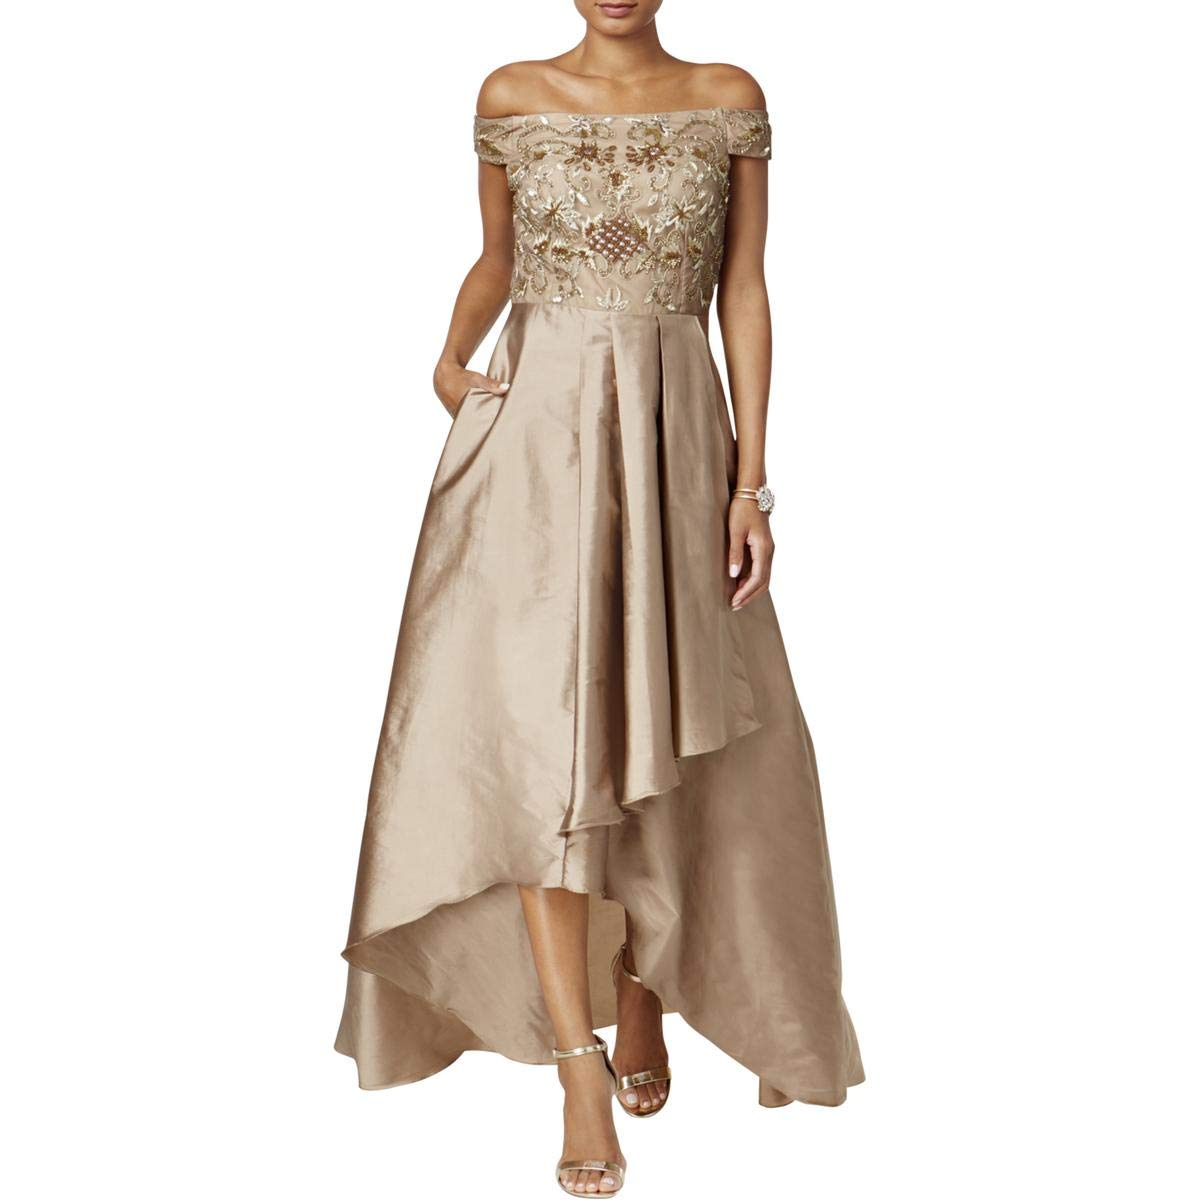 Antique Bronze Adrianna Papell Womens OffTheShoulder FullLength Formal Dress